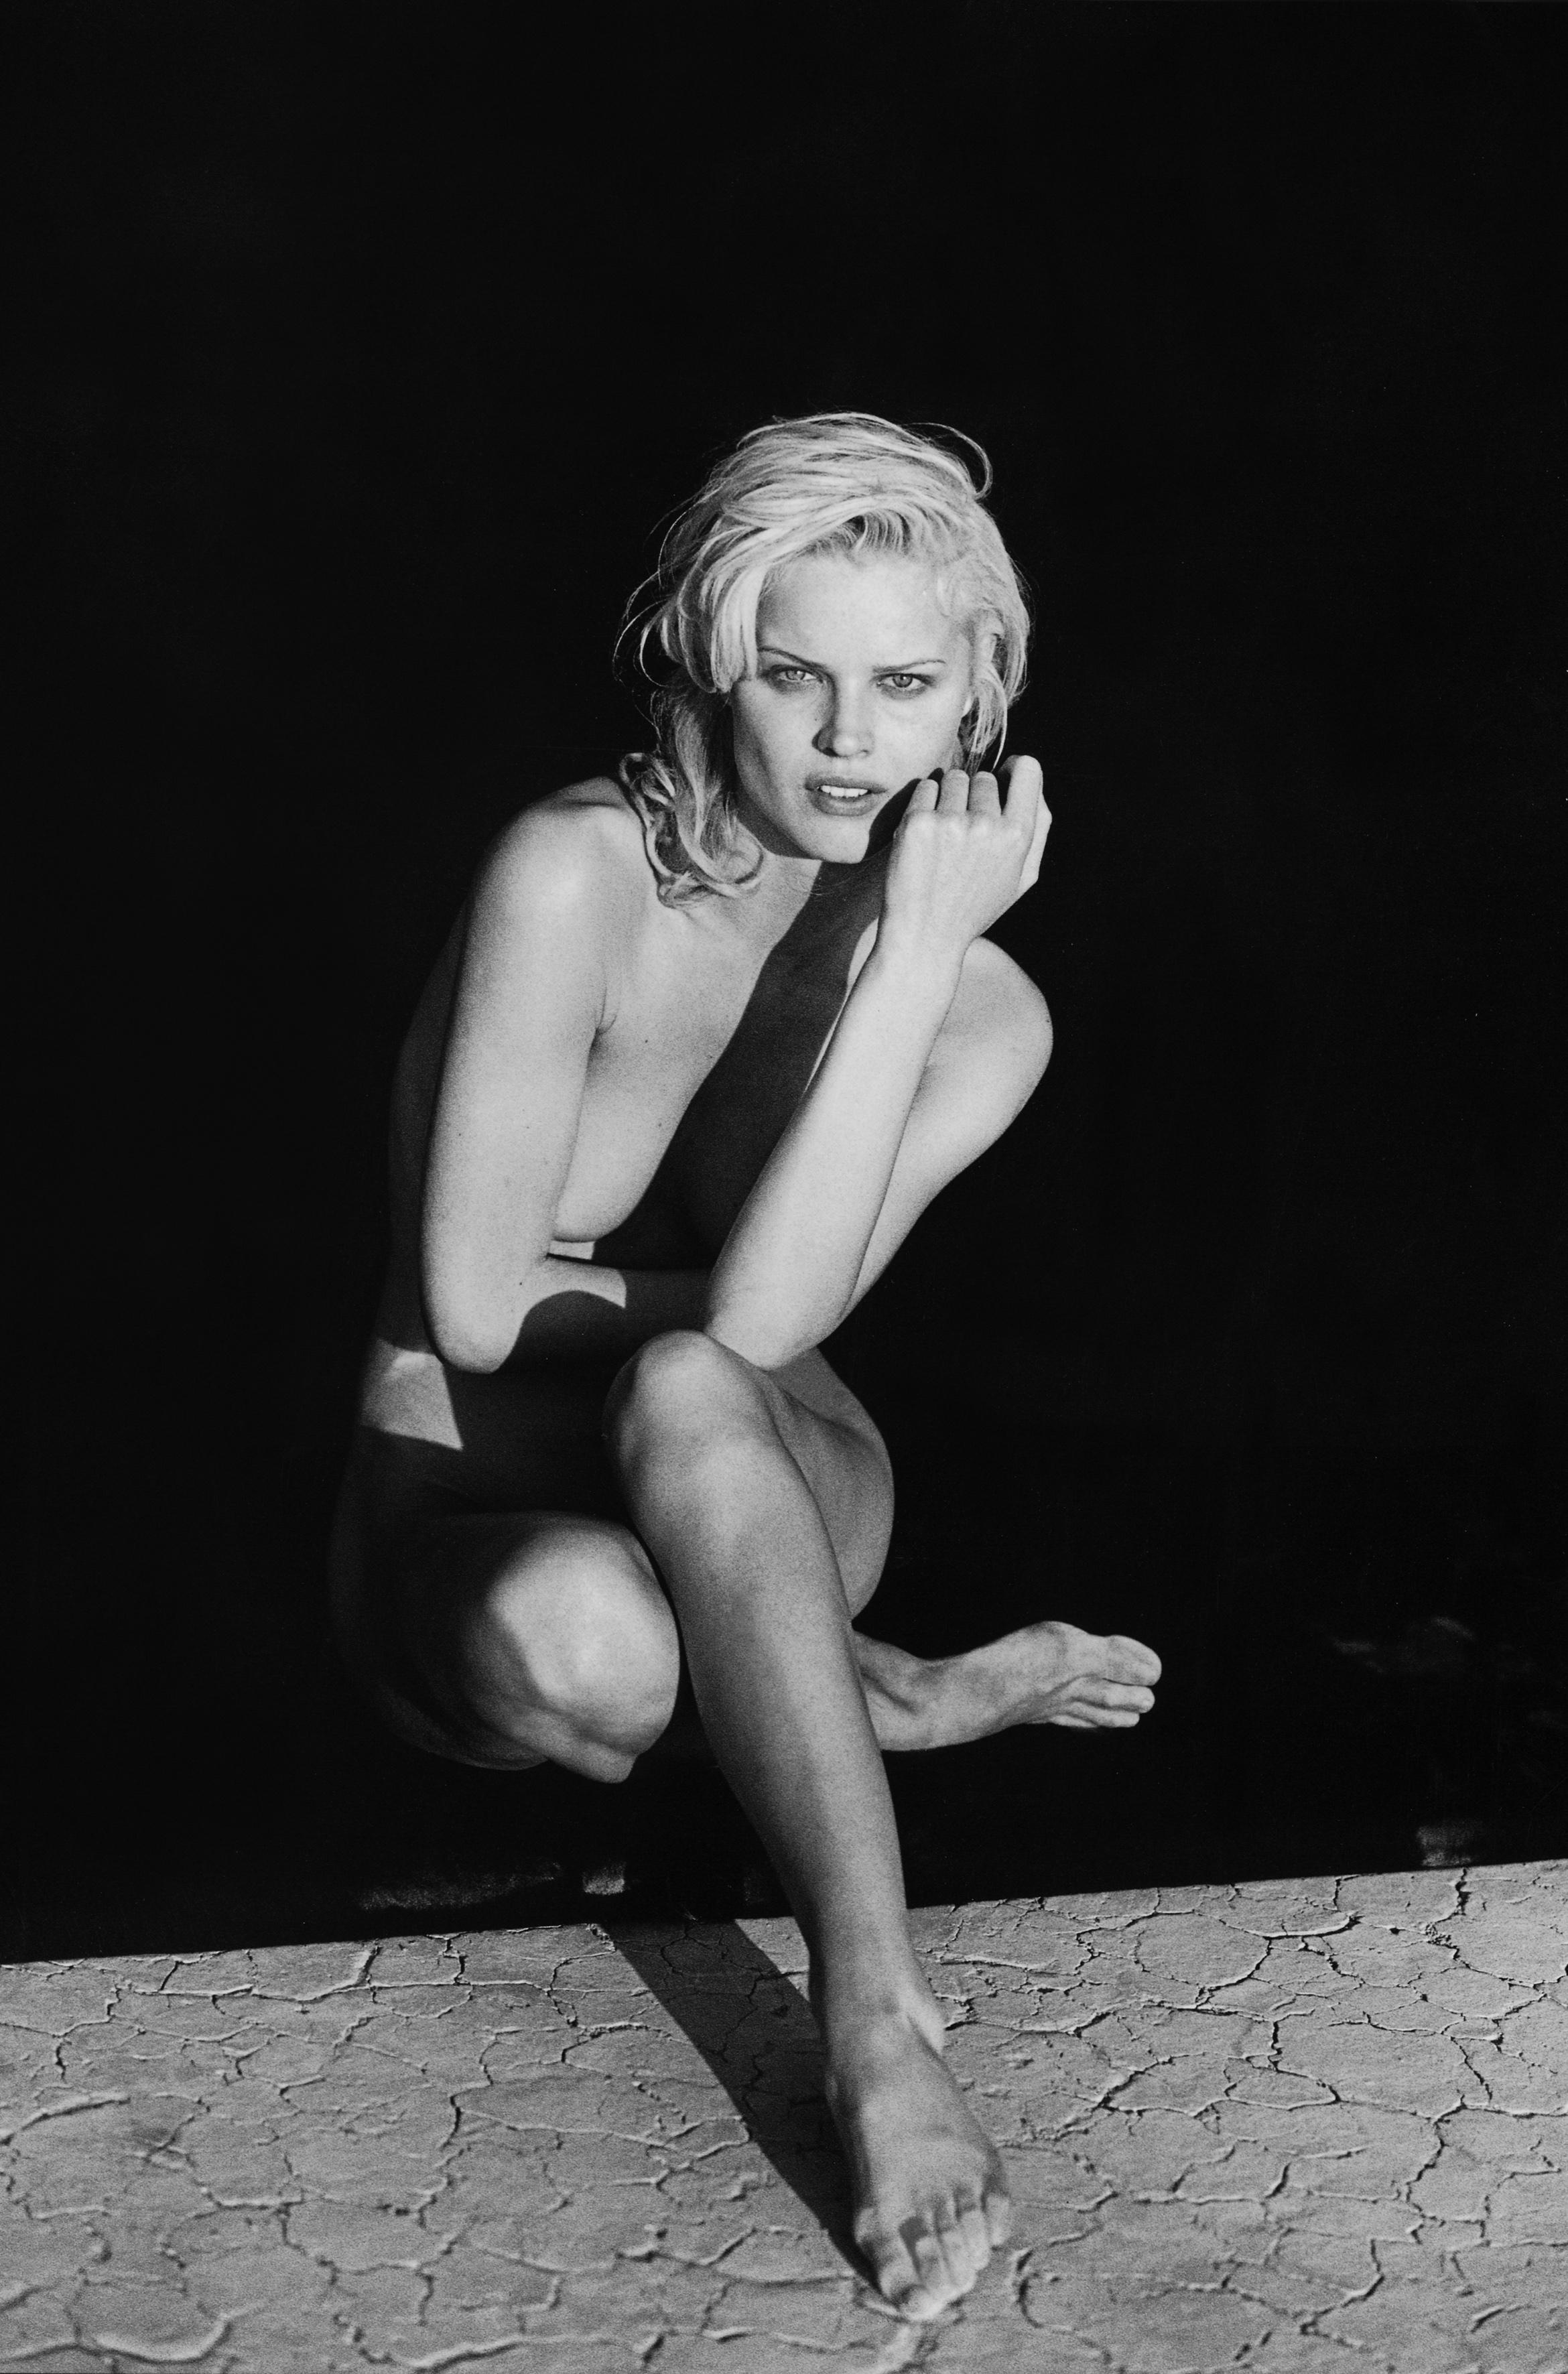 https://pics.wikifeet.com/Eva-Herzigova-Feet-2748429.jpg